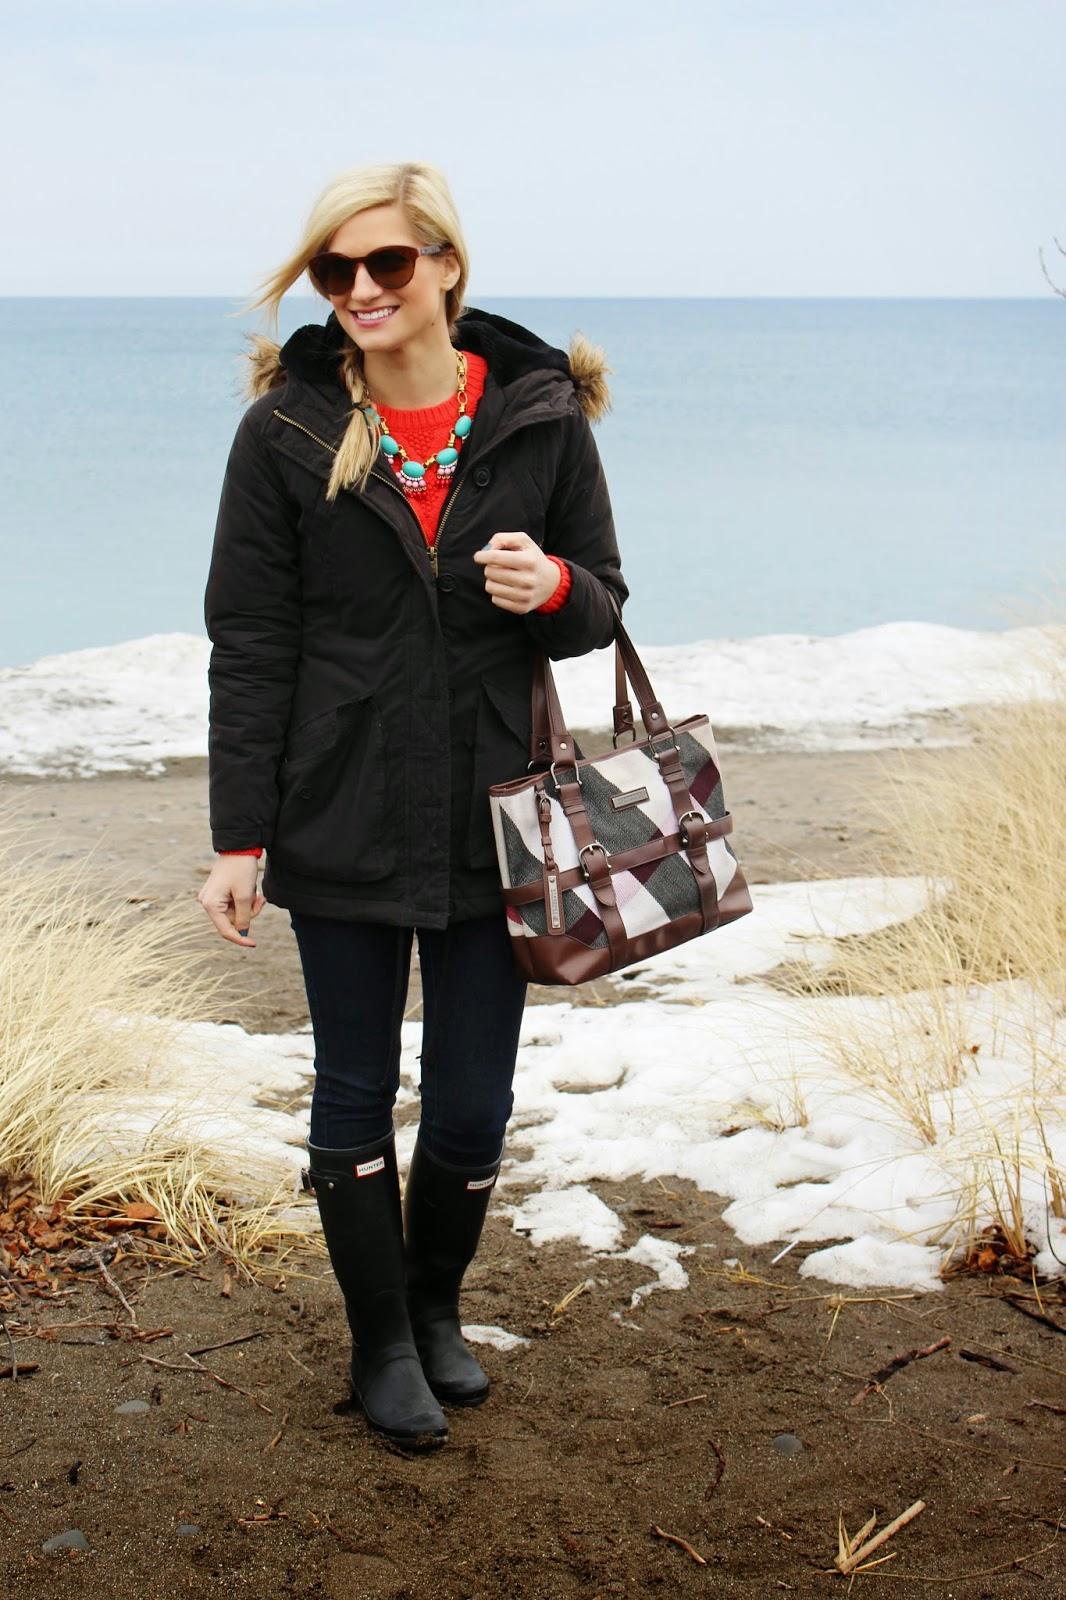 bijuleni - Burberry handbag